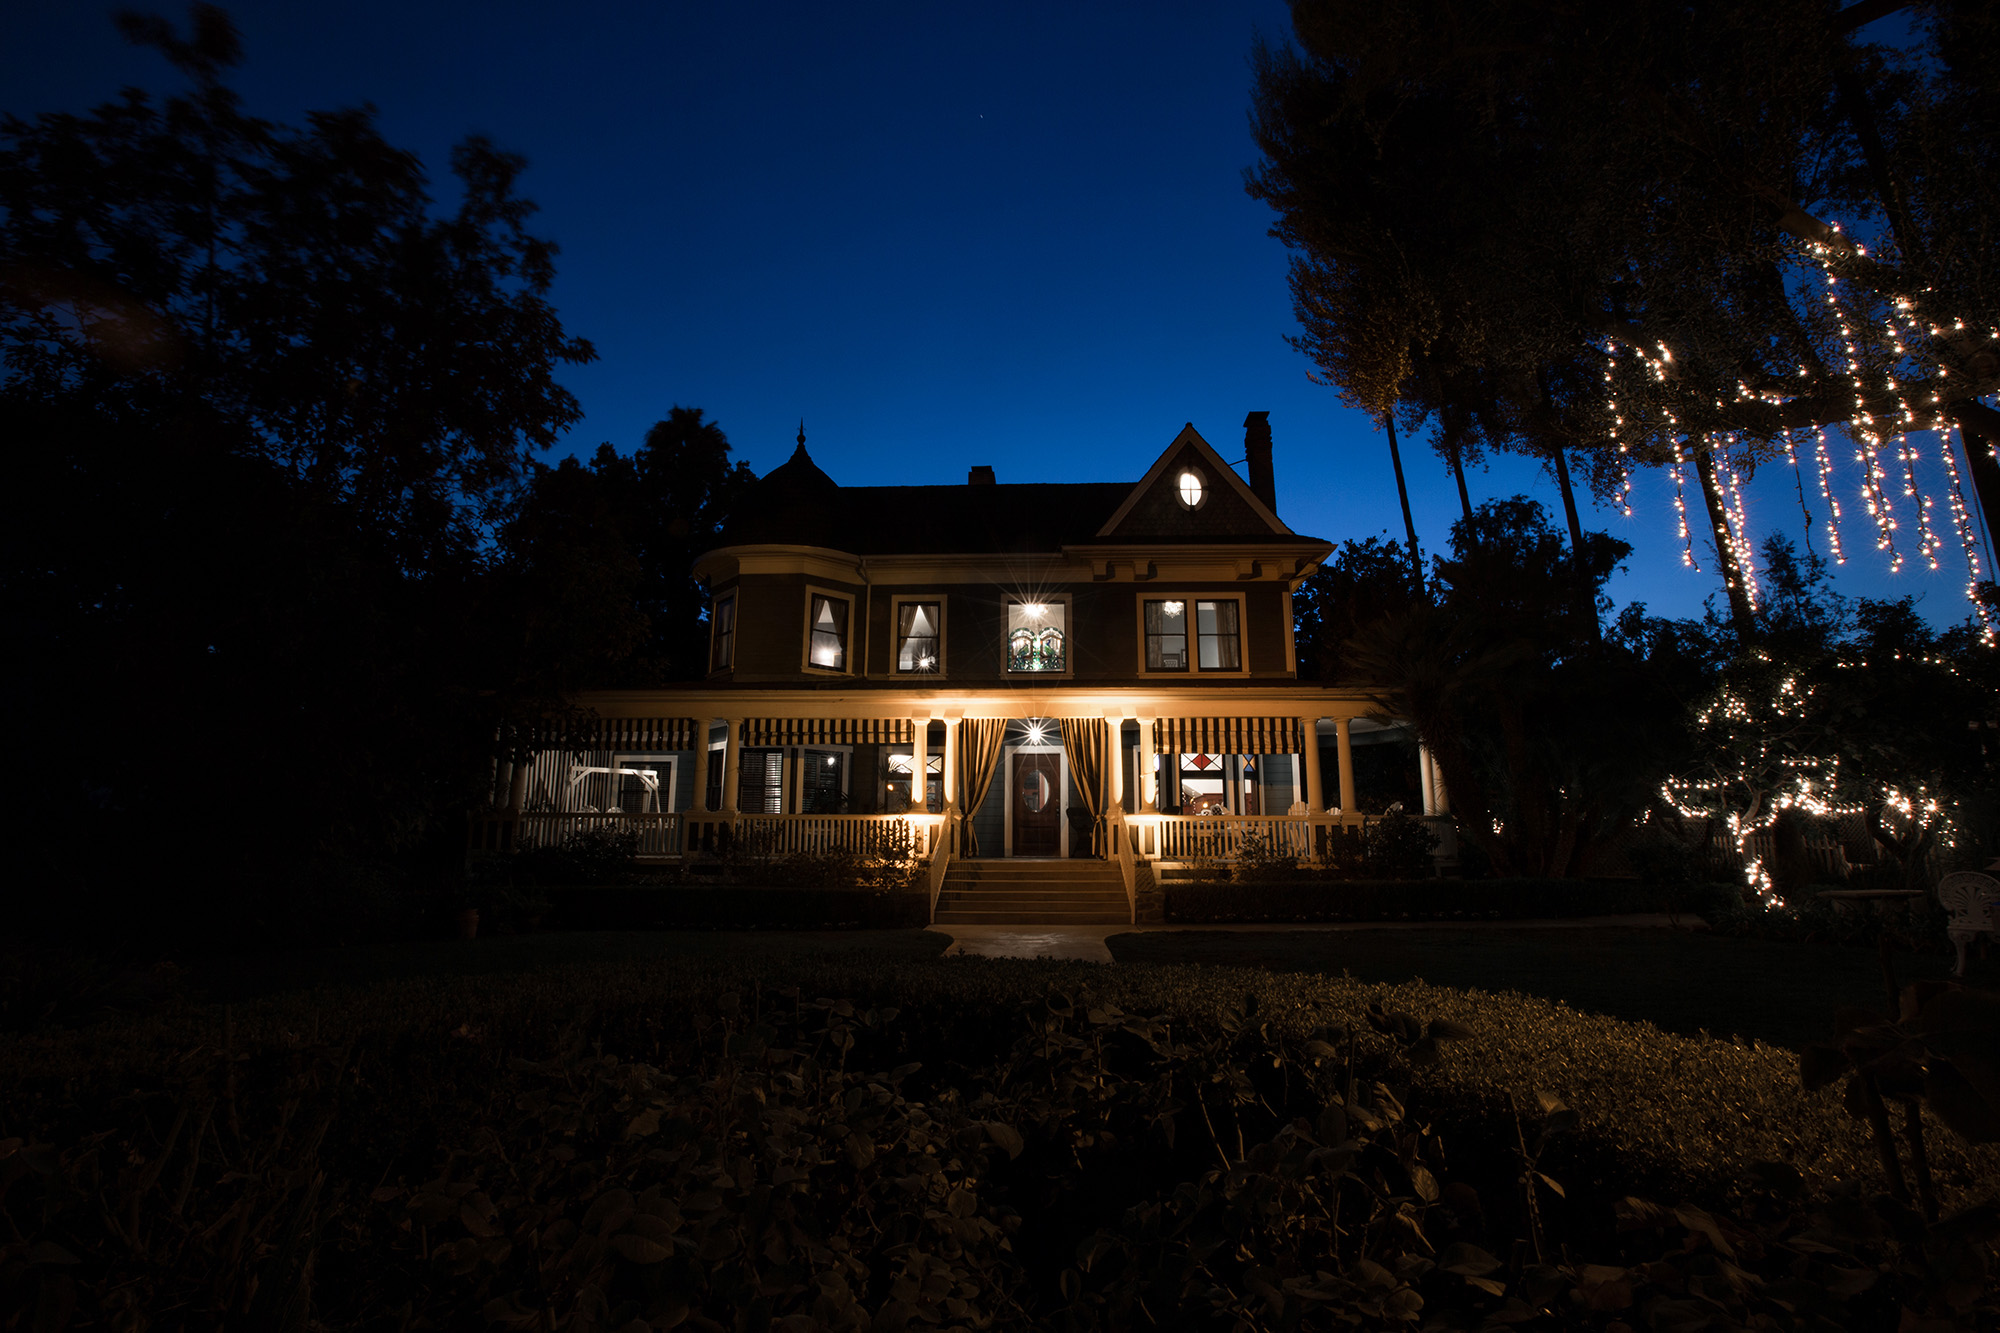 christmas-house-weddings-receptions-carrie-vines-004.jpg